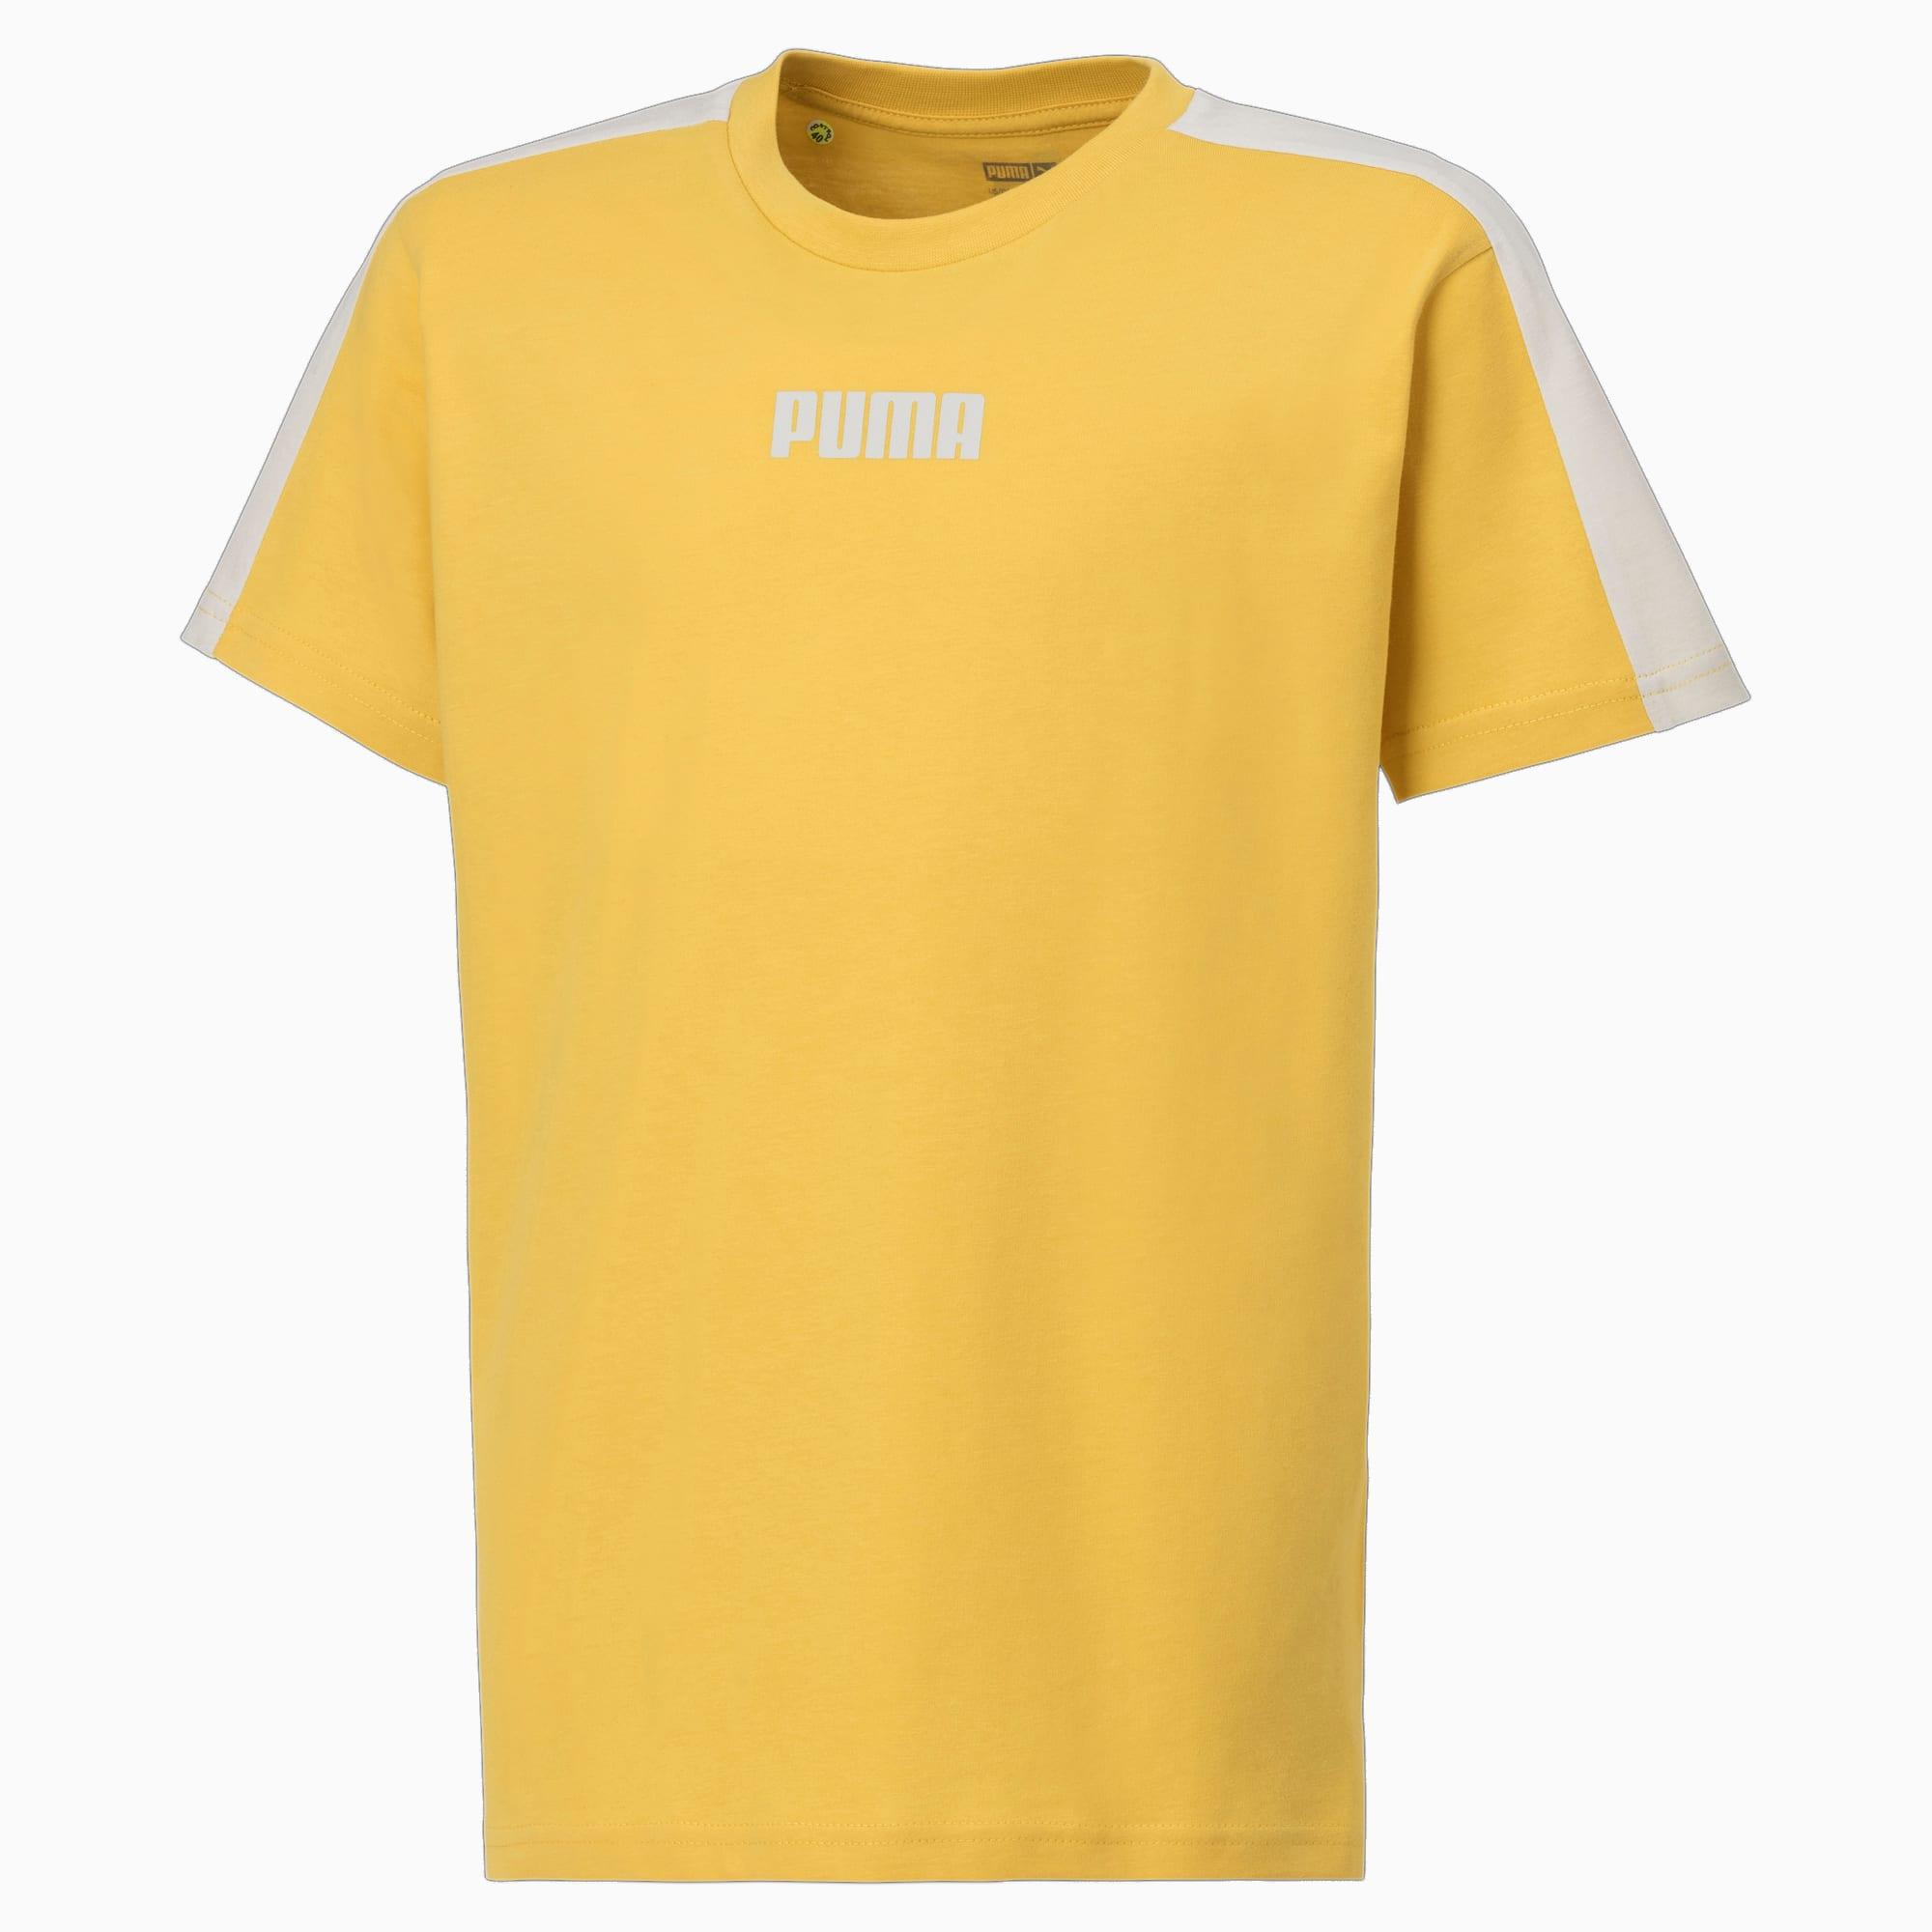 PUMA Logo Kinder T-Shirt   Mit Aucun   Gelb